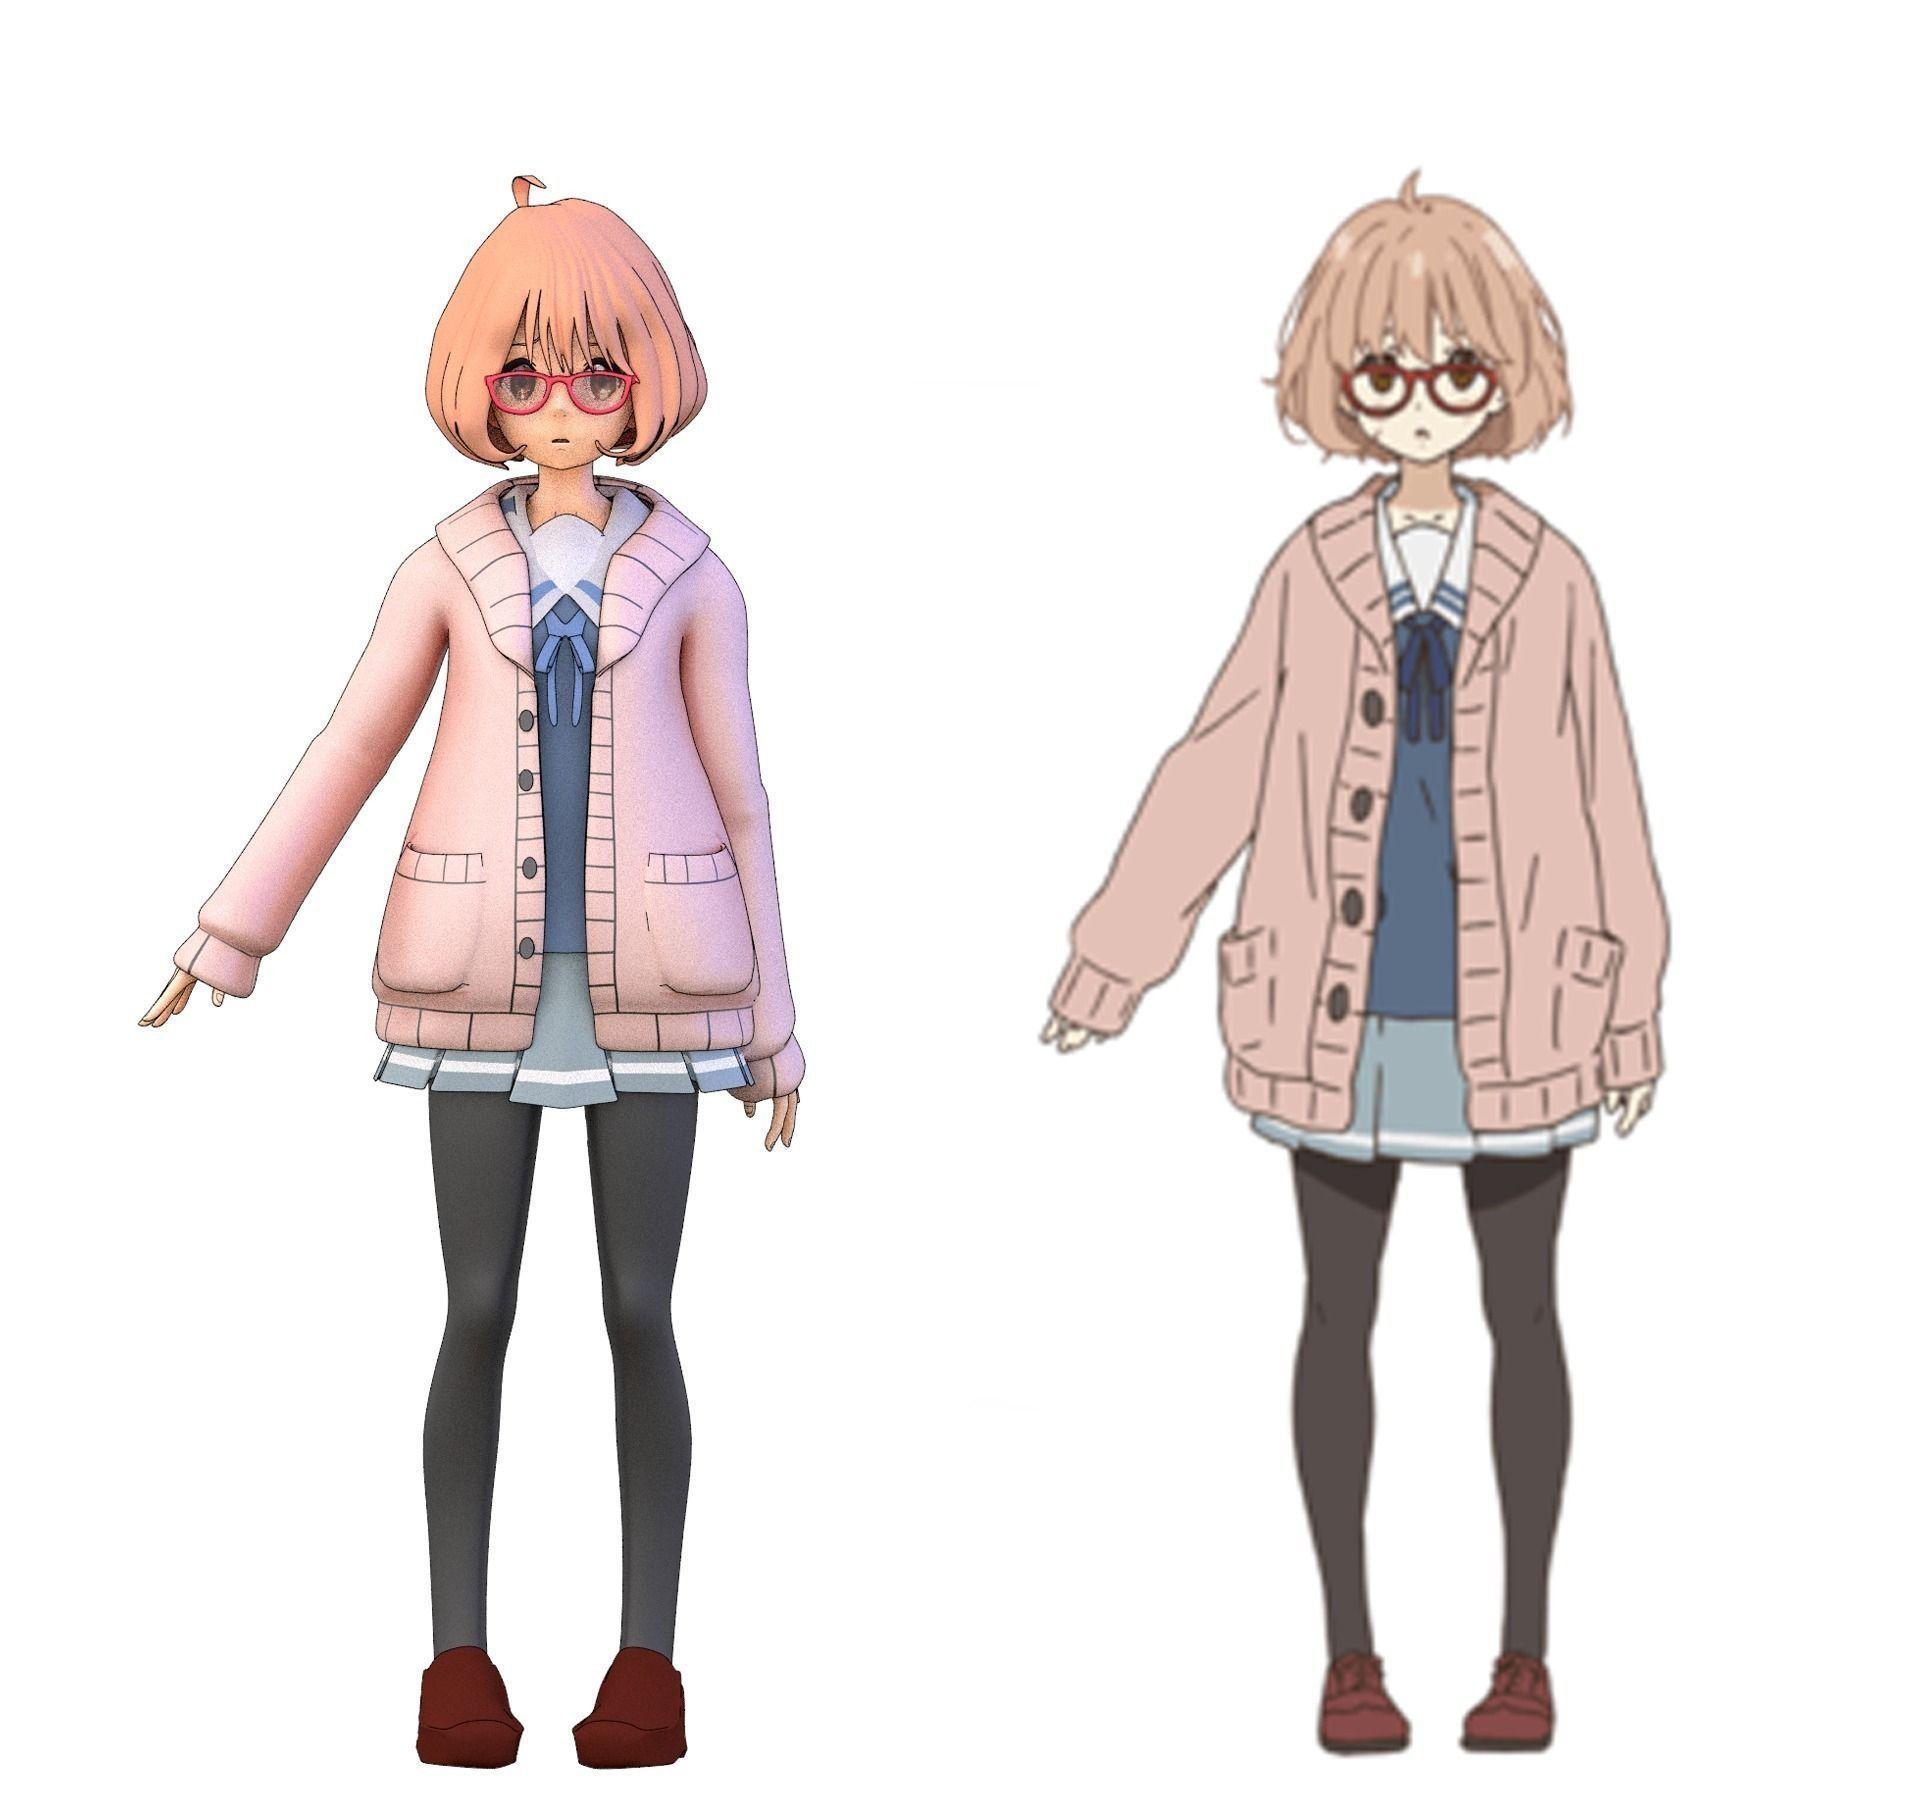 mirai from kyoukai no kanata 3d model blend 1(画像あり